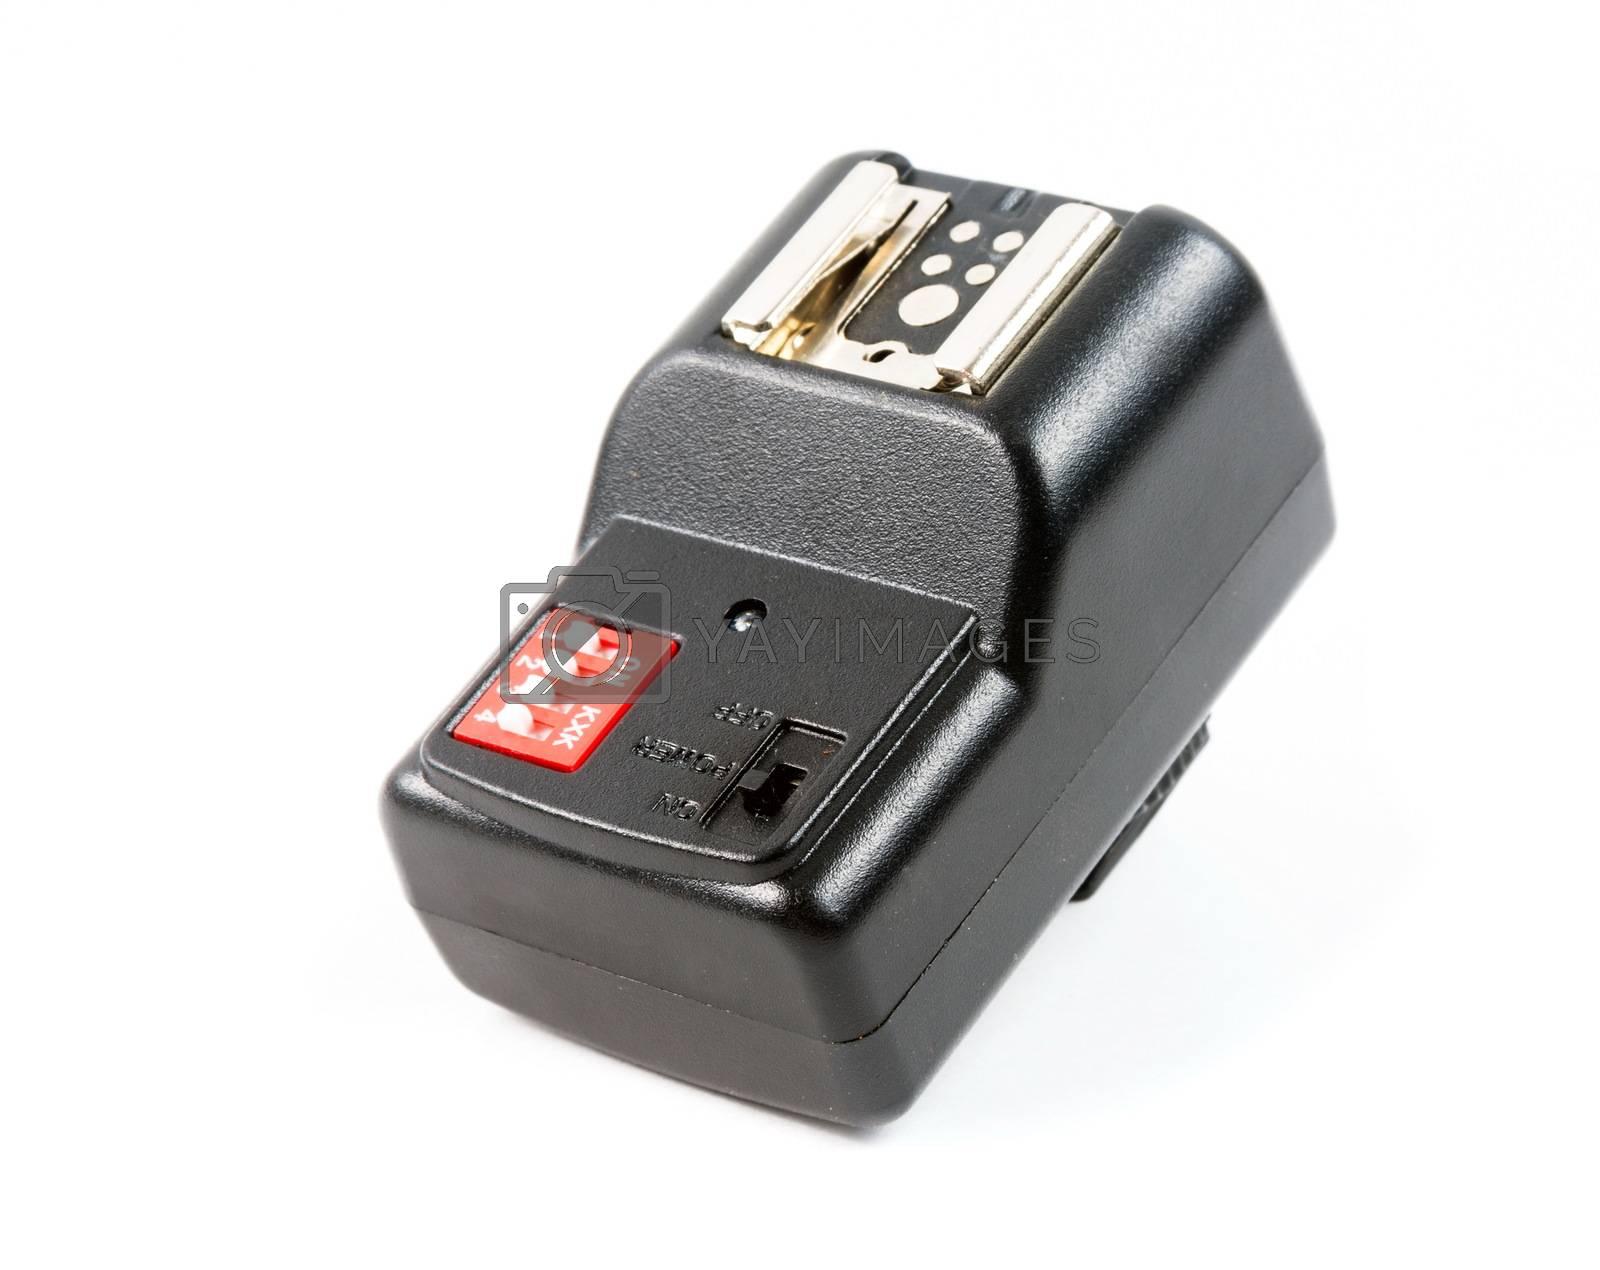 Black studio flash transmitter on the white